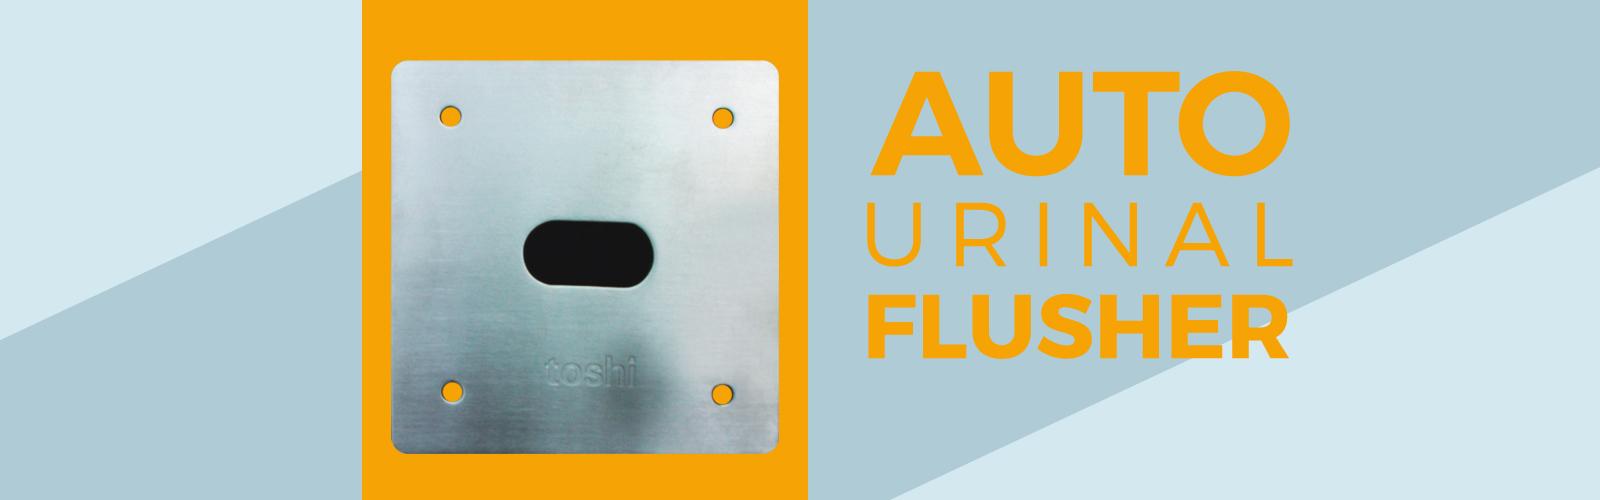 Auto Urinal Flusher <span> Hygiene System